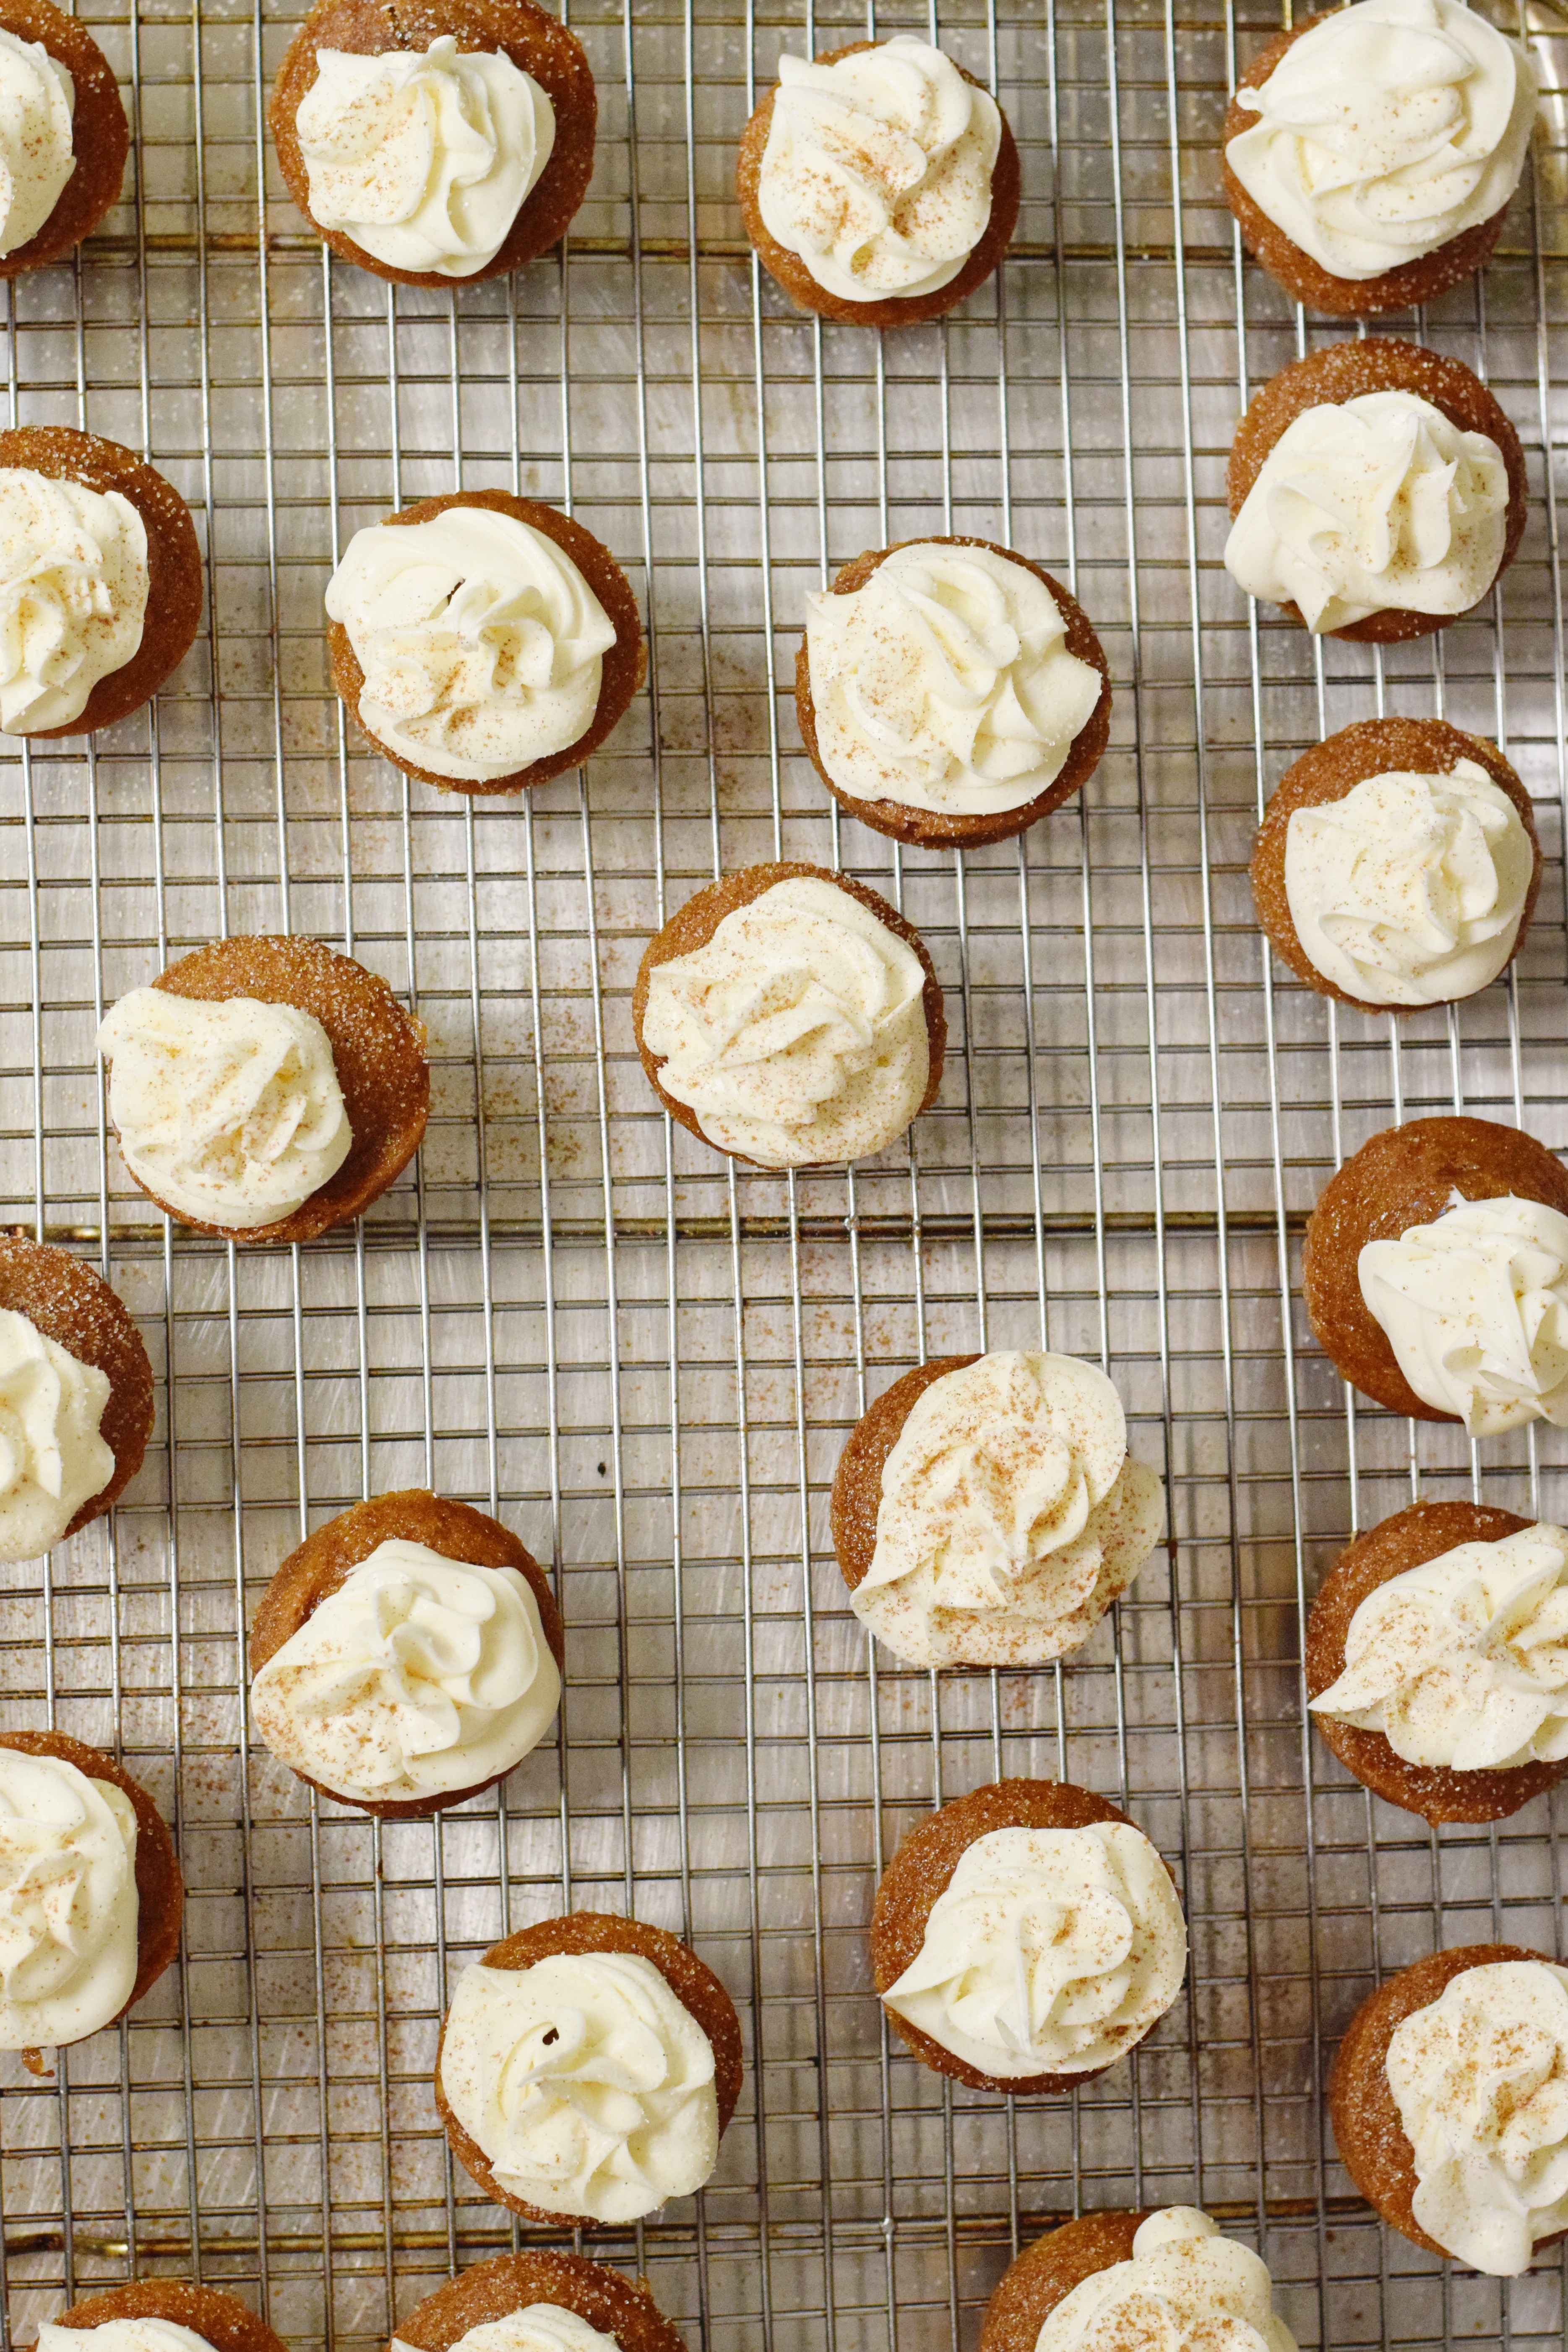 Gingerbread Mini Cupcakes - Holiday Desserts - Easy Gluten Free Dessert - Desserts For Christmas - Christmas Dessert - Mini Dessert Recipe - Communikait by Kait Hanson